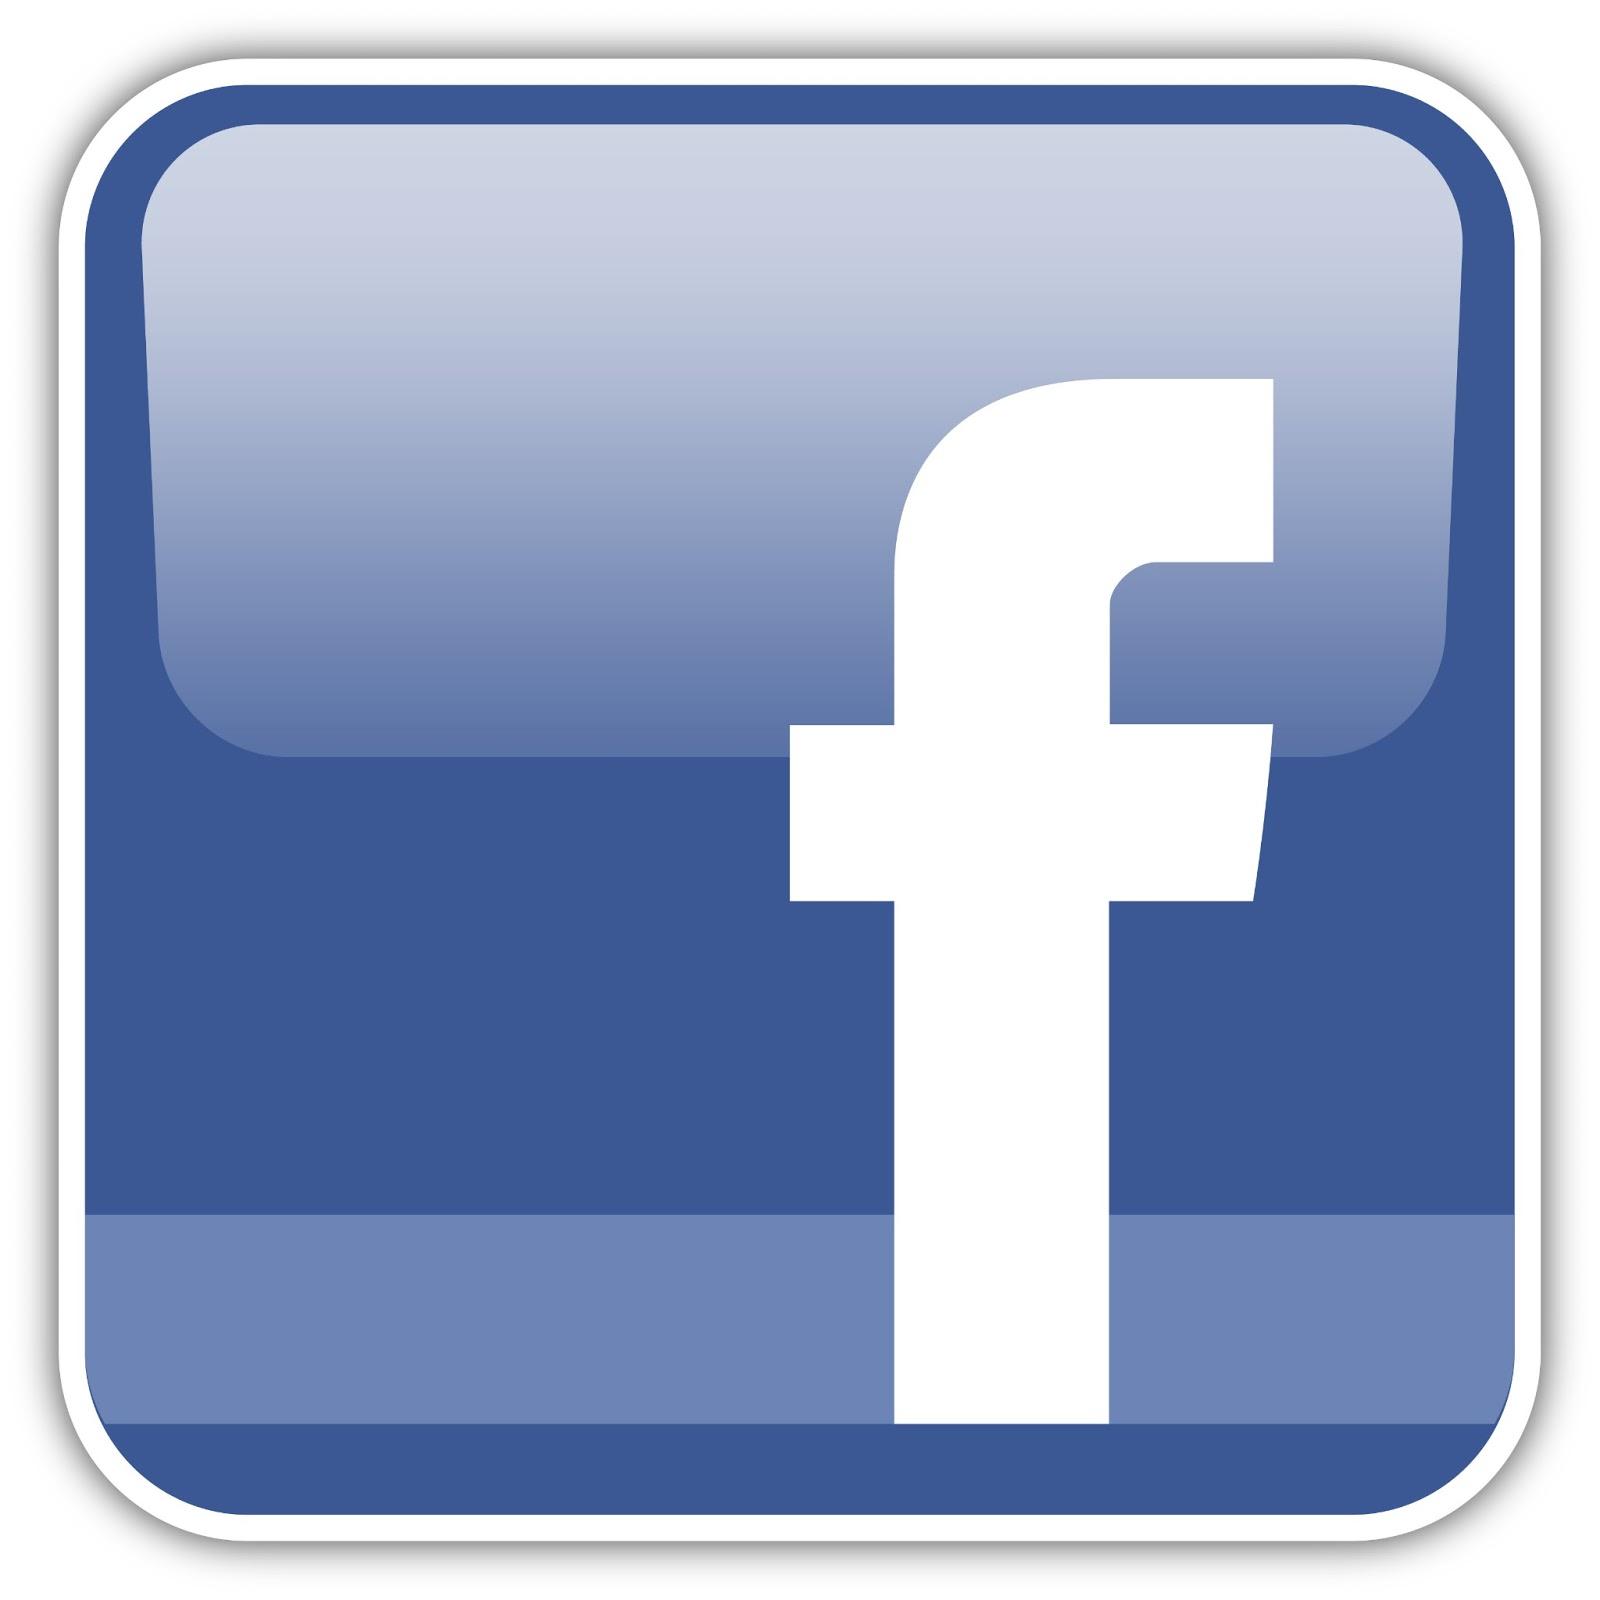 thu-thuat-doi-ten-facebook-qua-5-lan-0